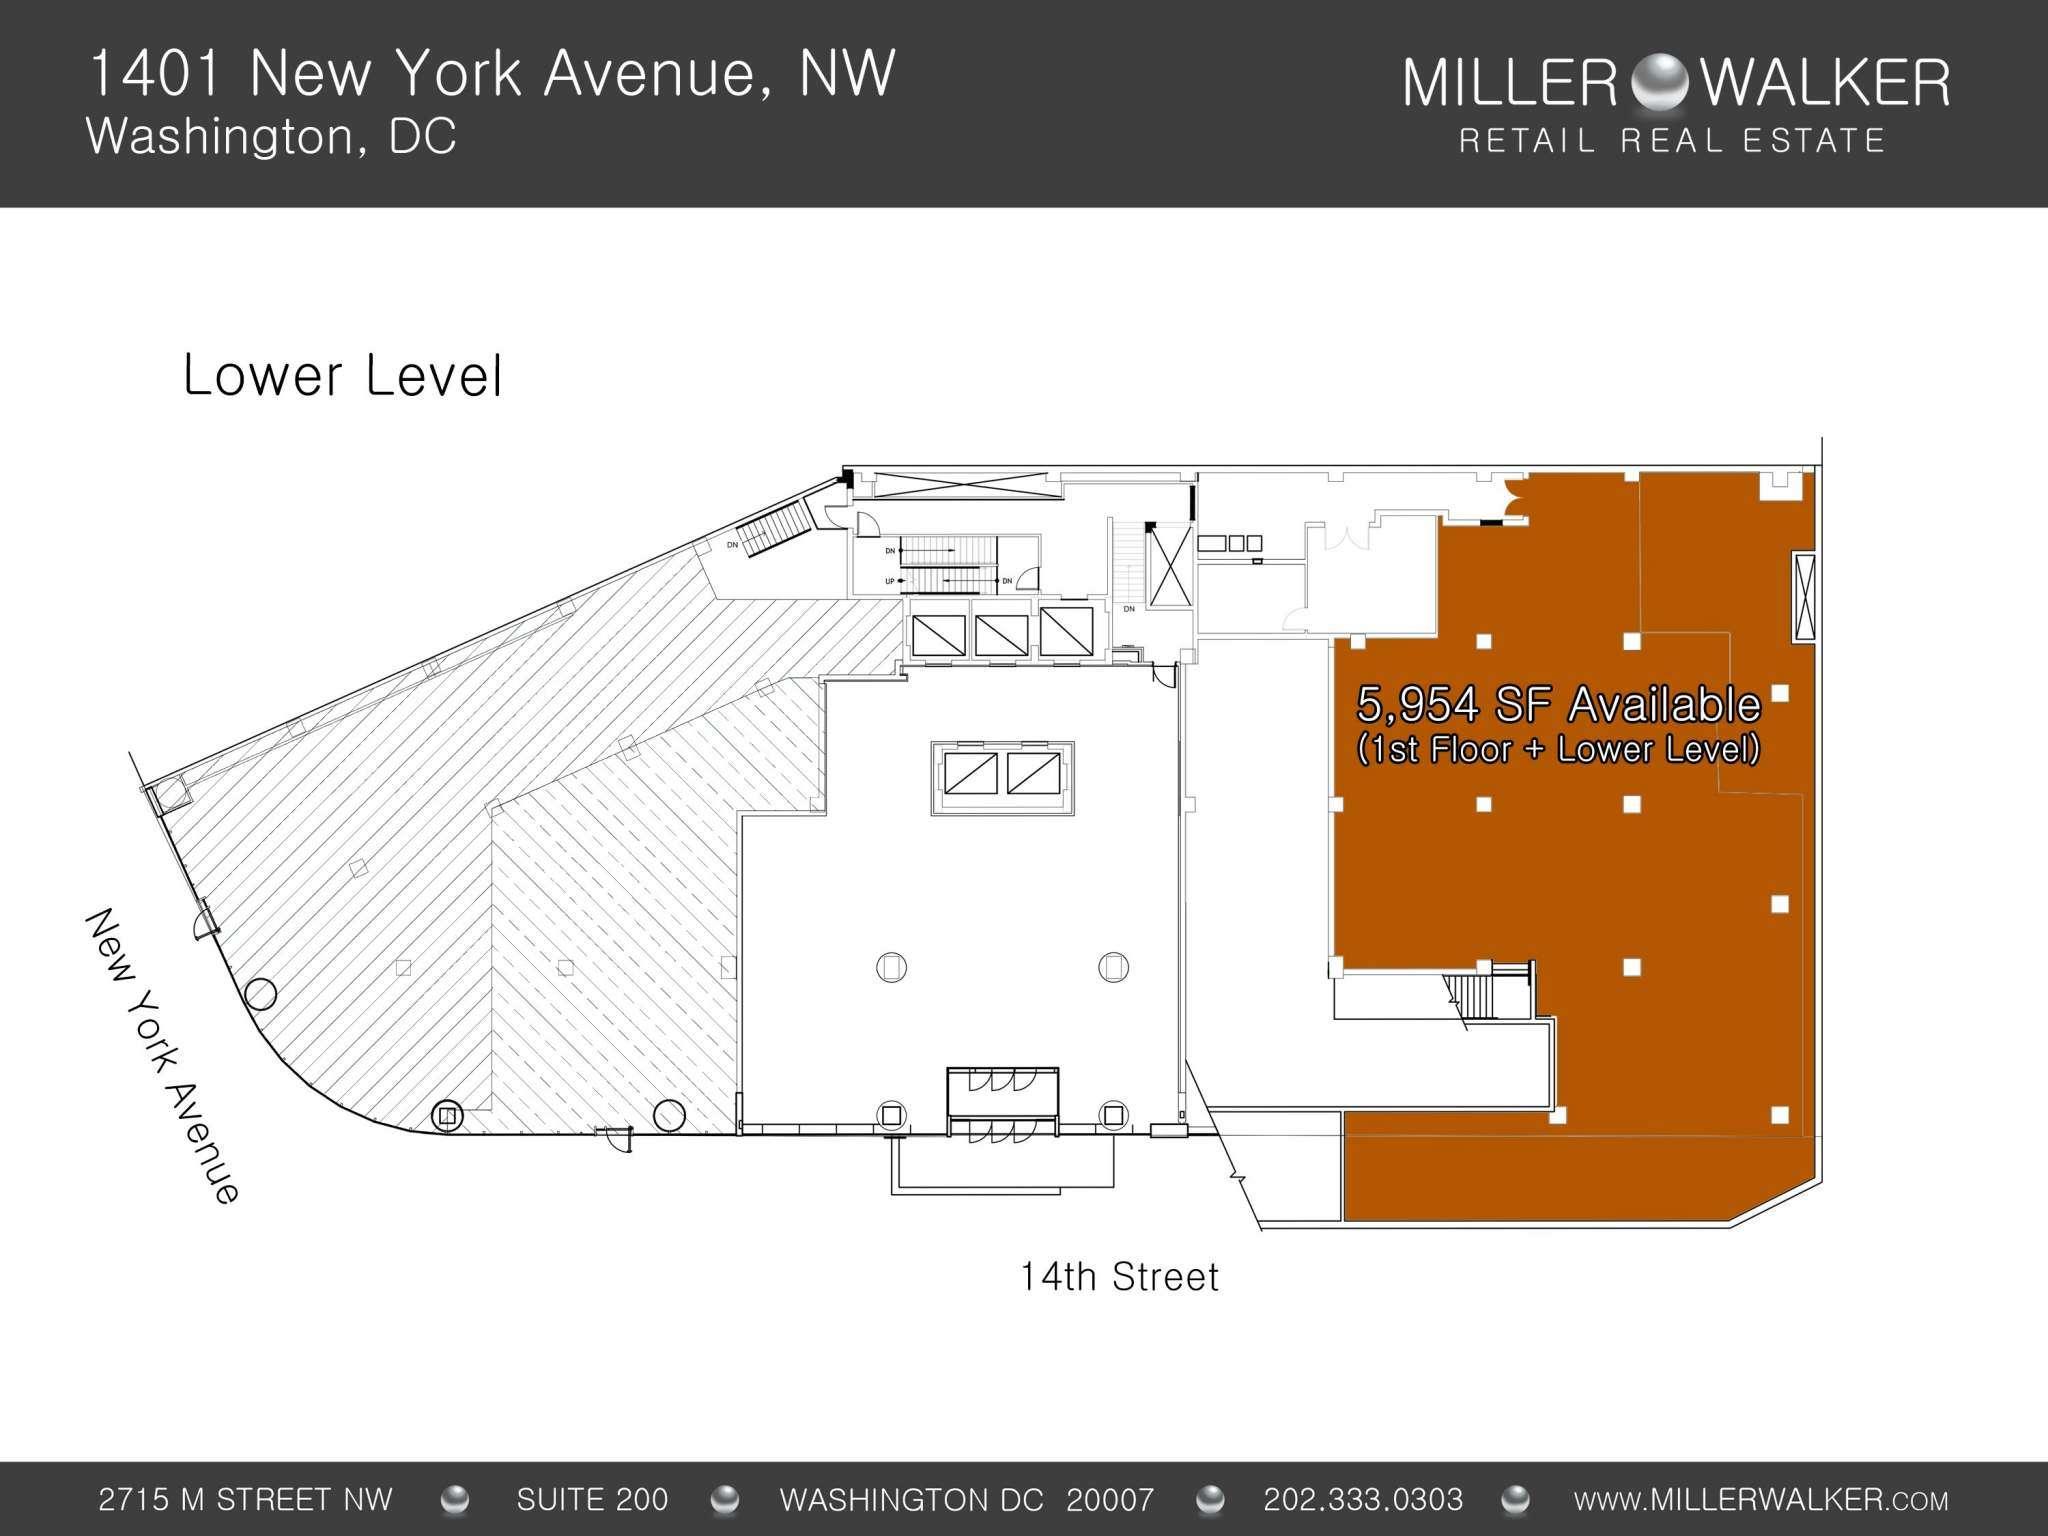 1401-new-york-avenue-floor-plans-9-30-2016_page_3